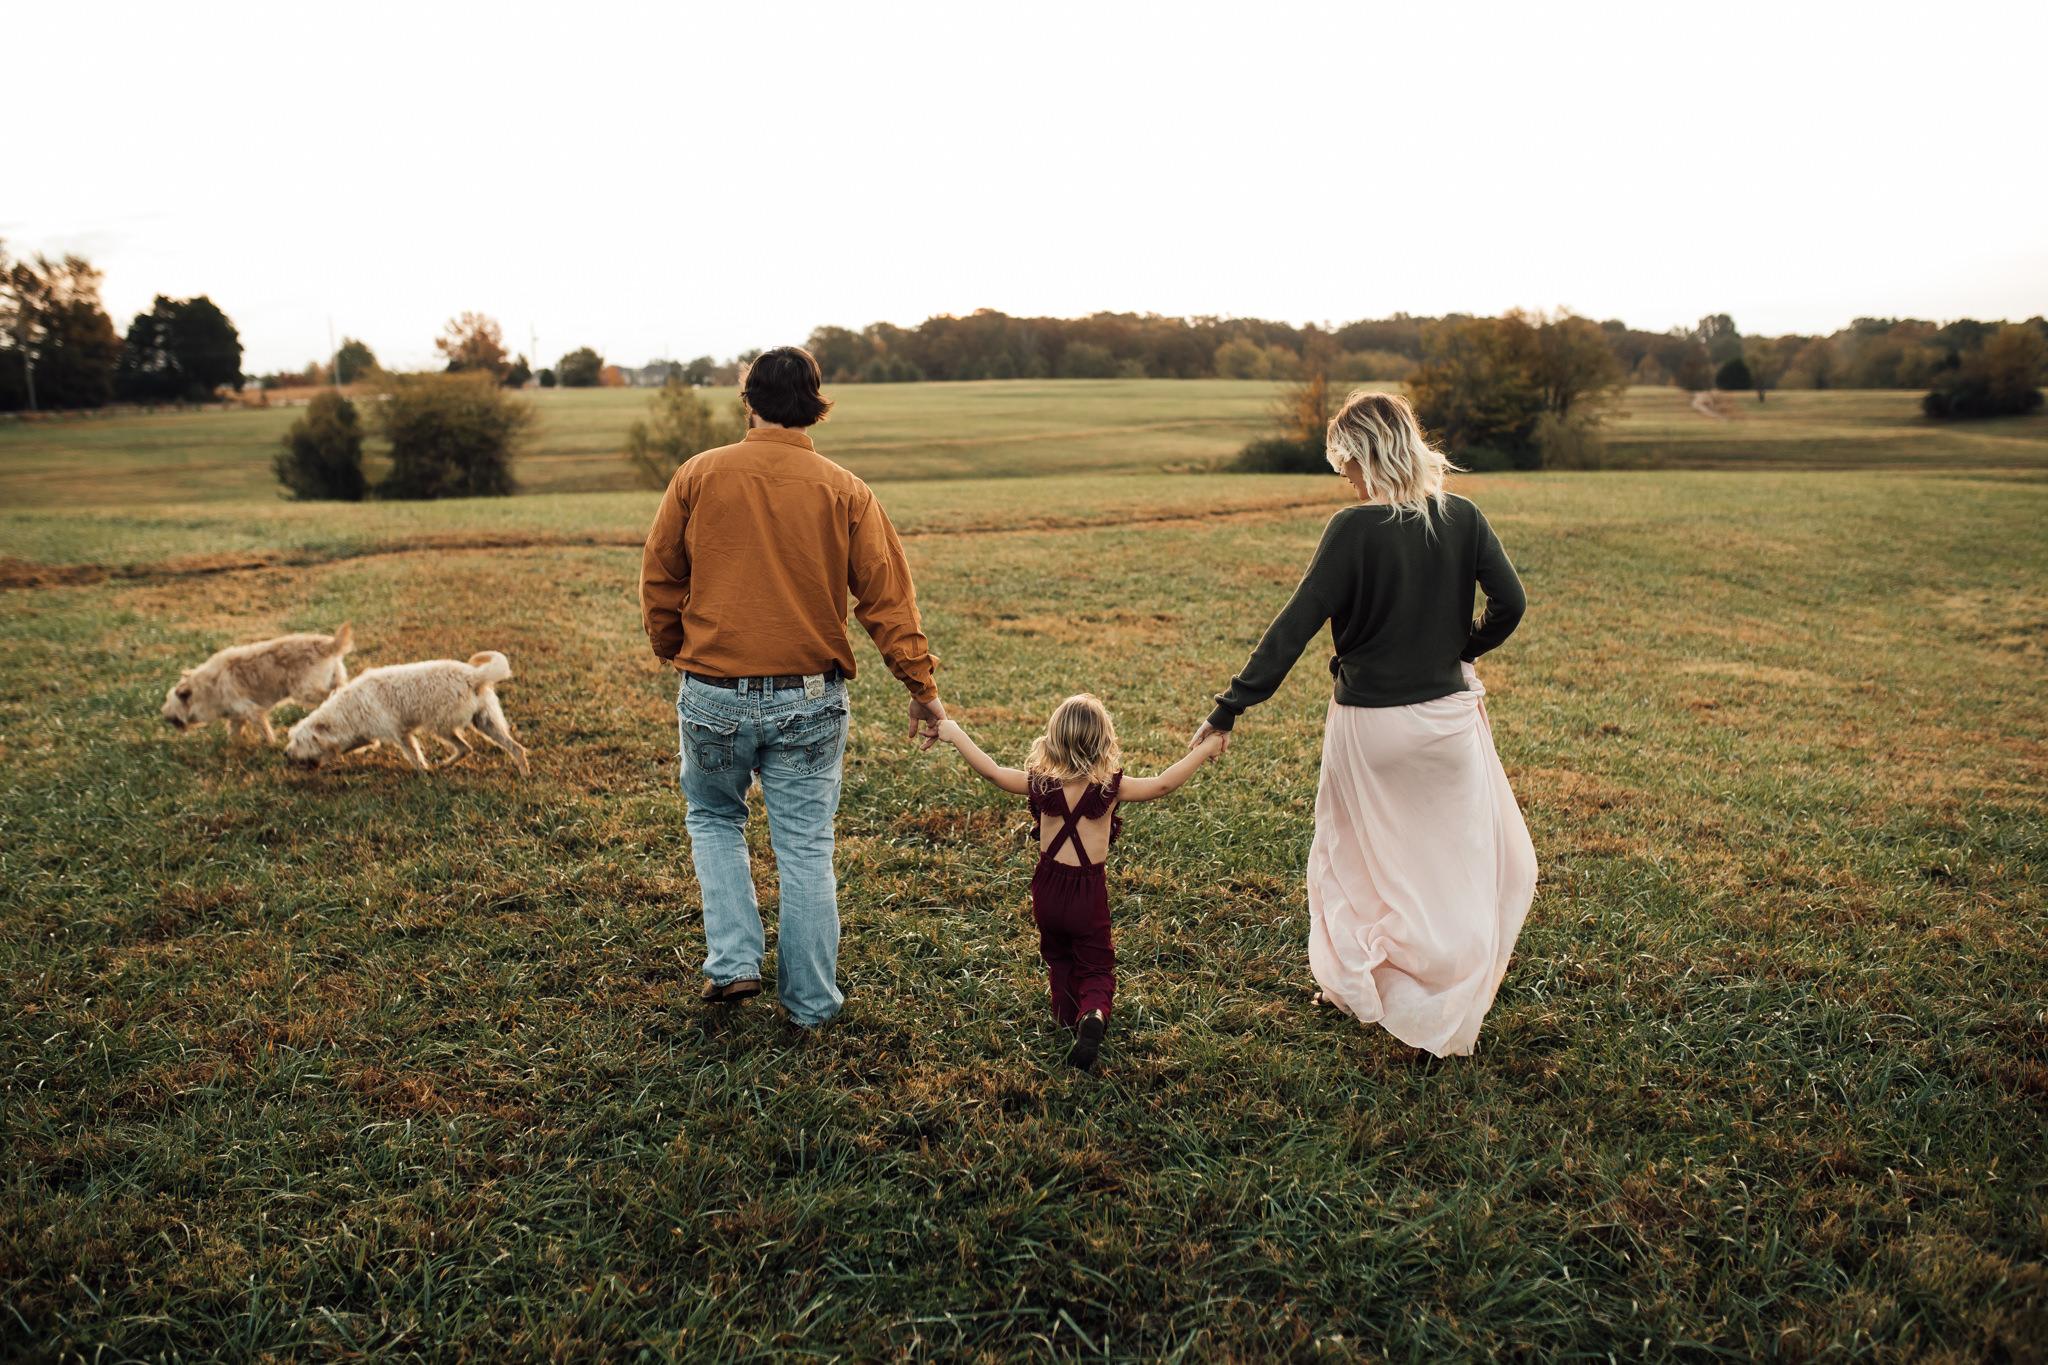 cassie-cook-photography-memphis-family-photographer-lifestyle-family-photographer-sunrise-gray-family-5.jpg